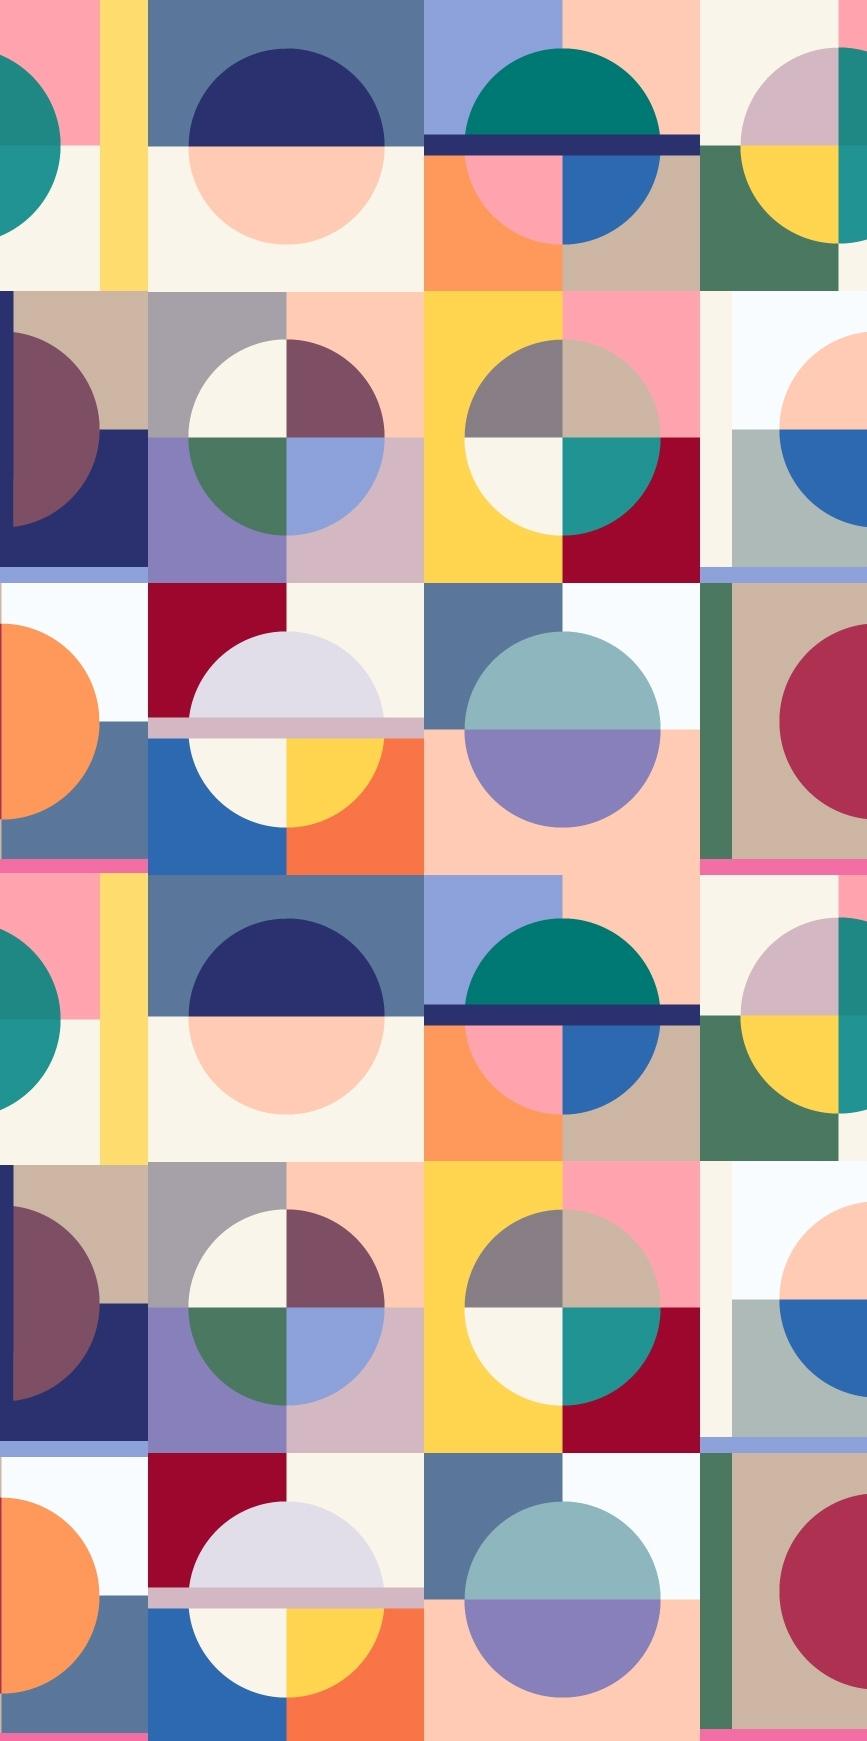 lorena_maranon_surface_pattern.jpg